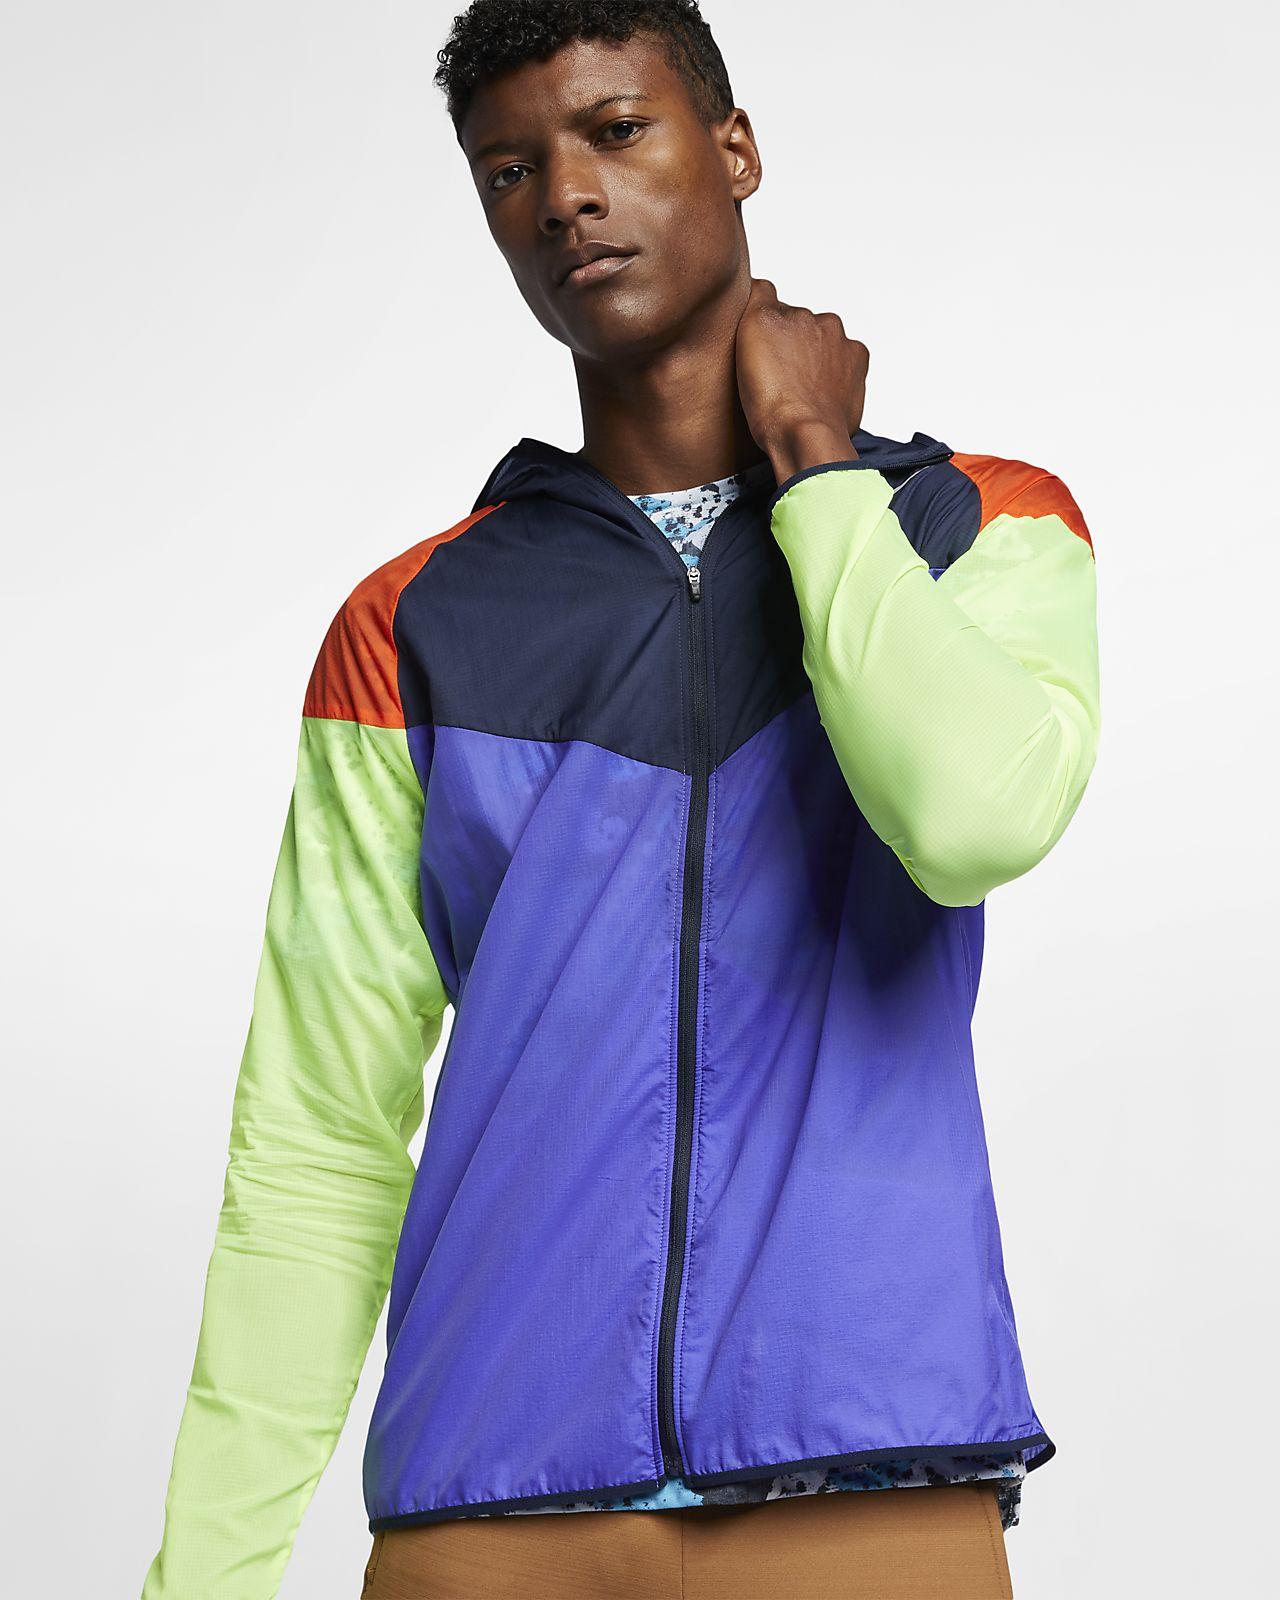 anteprima di 100% di alta qualità nuovo arriva Giacca da running Nike Windrunner - Uomo